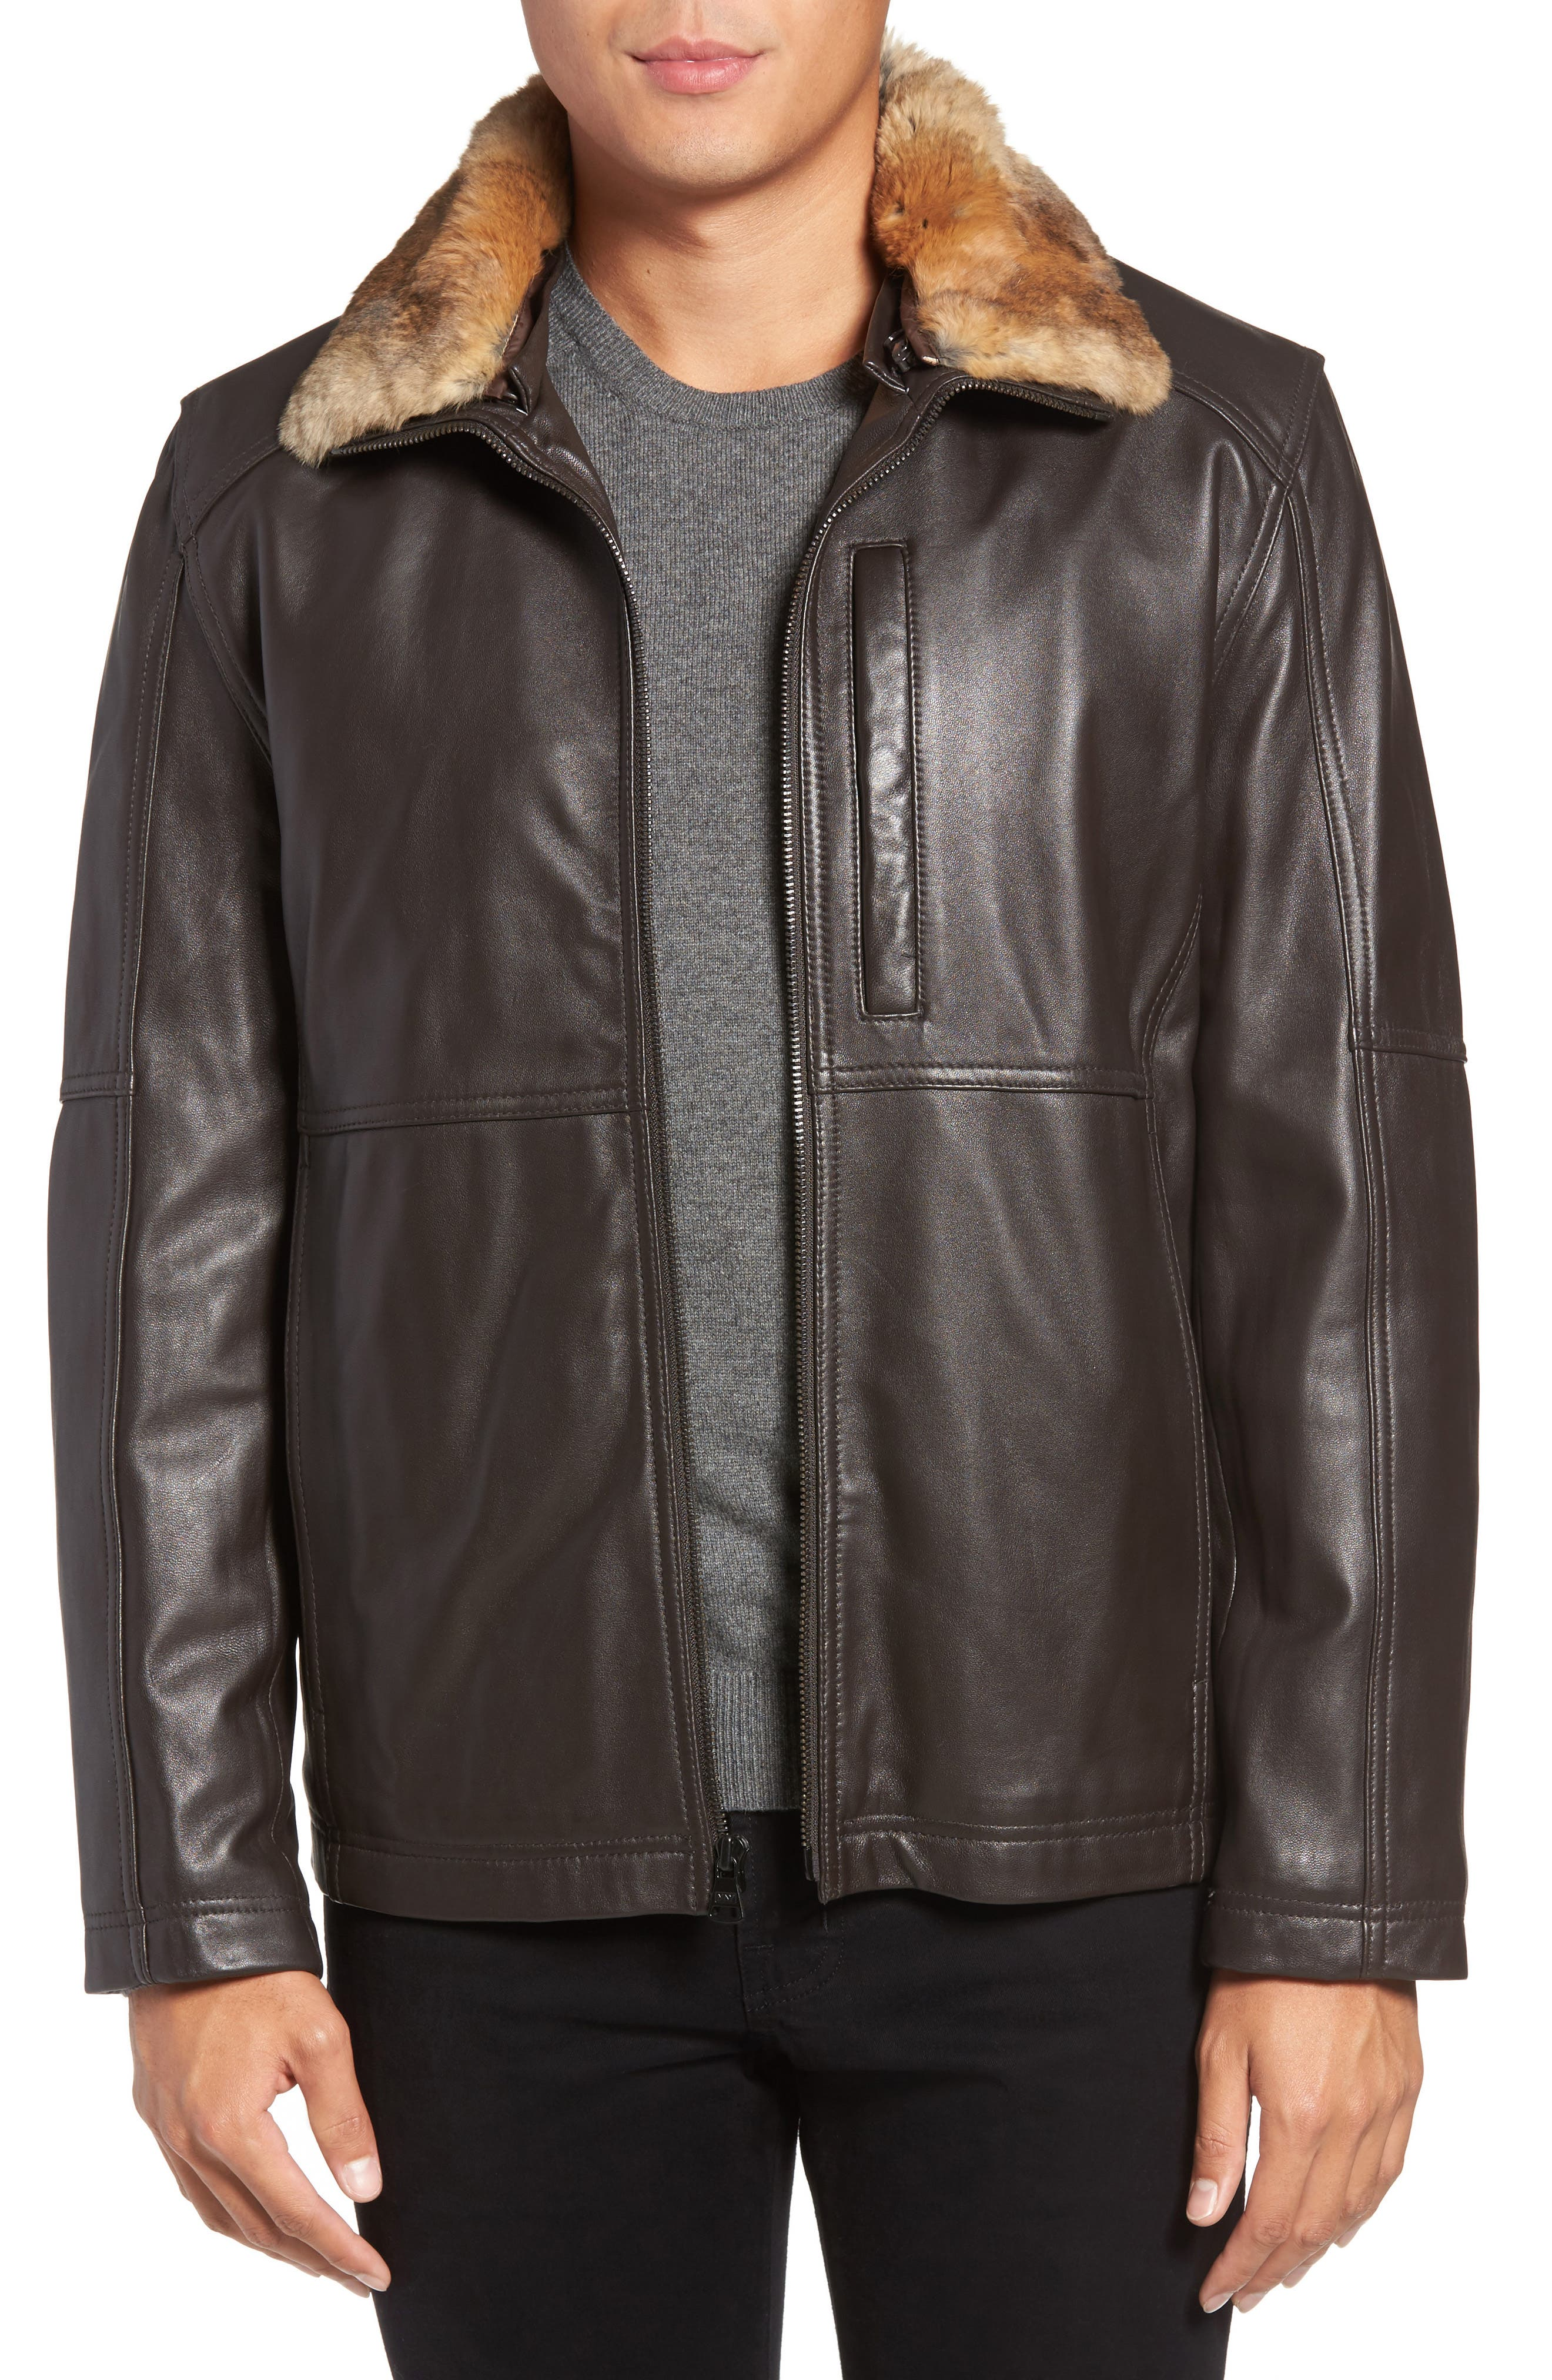 Main Image - Marc New York Lambskin Leather Jacket with Genuine Rabbit Fur Trim